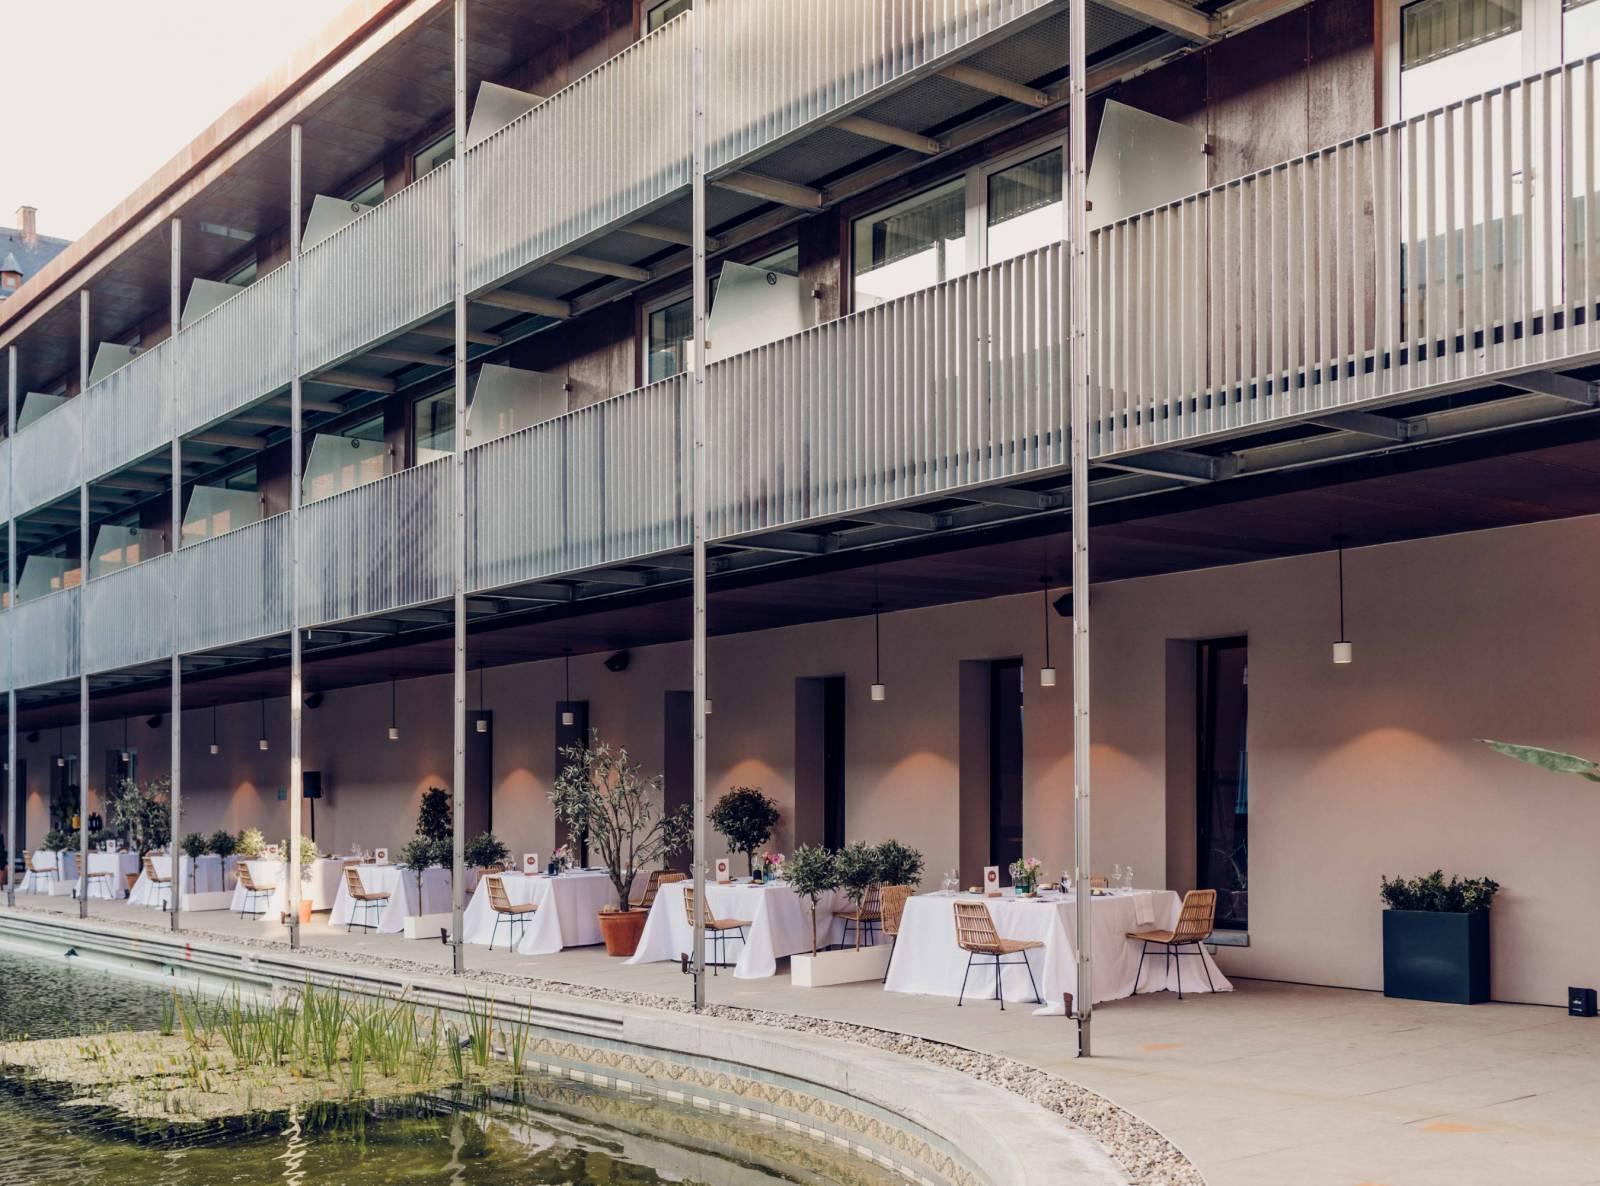 Feestal - Van der Valk hotel Mechelen - House of Weddings (18)